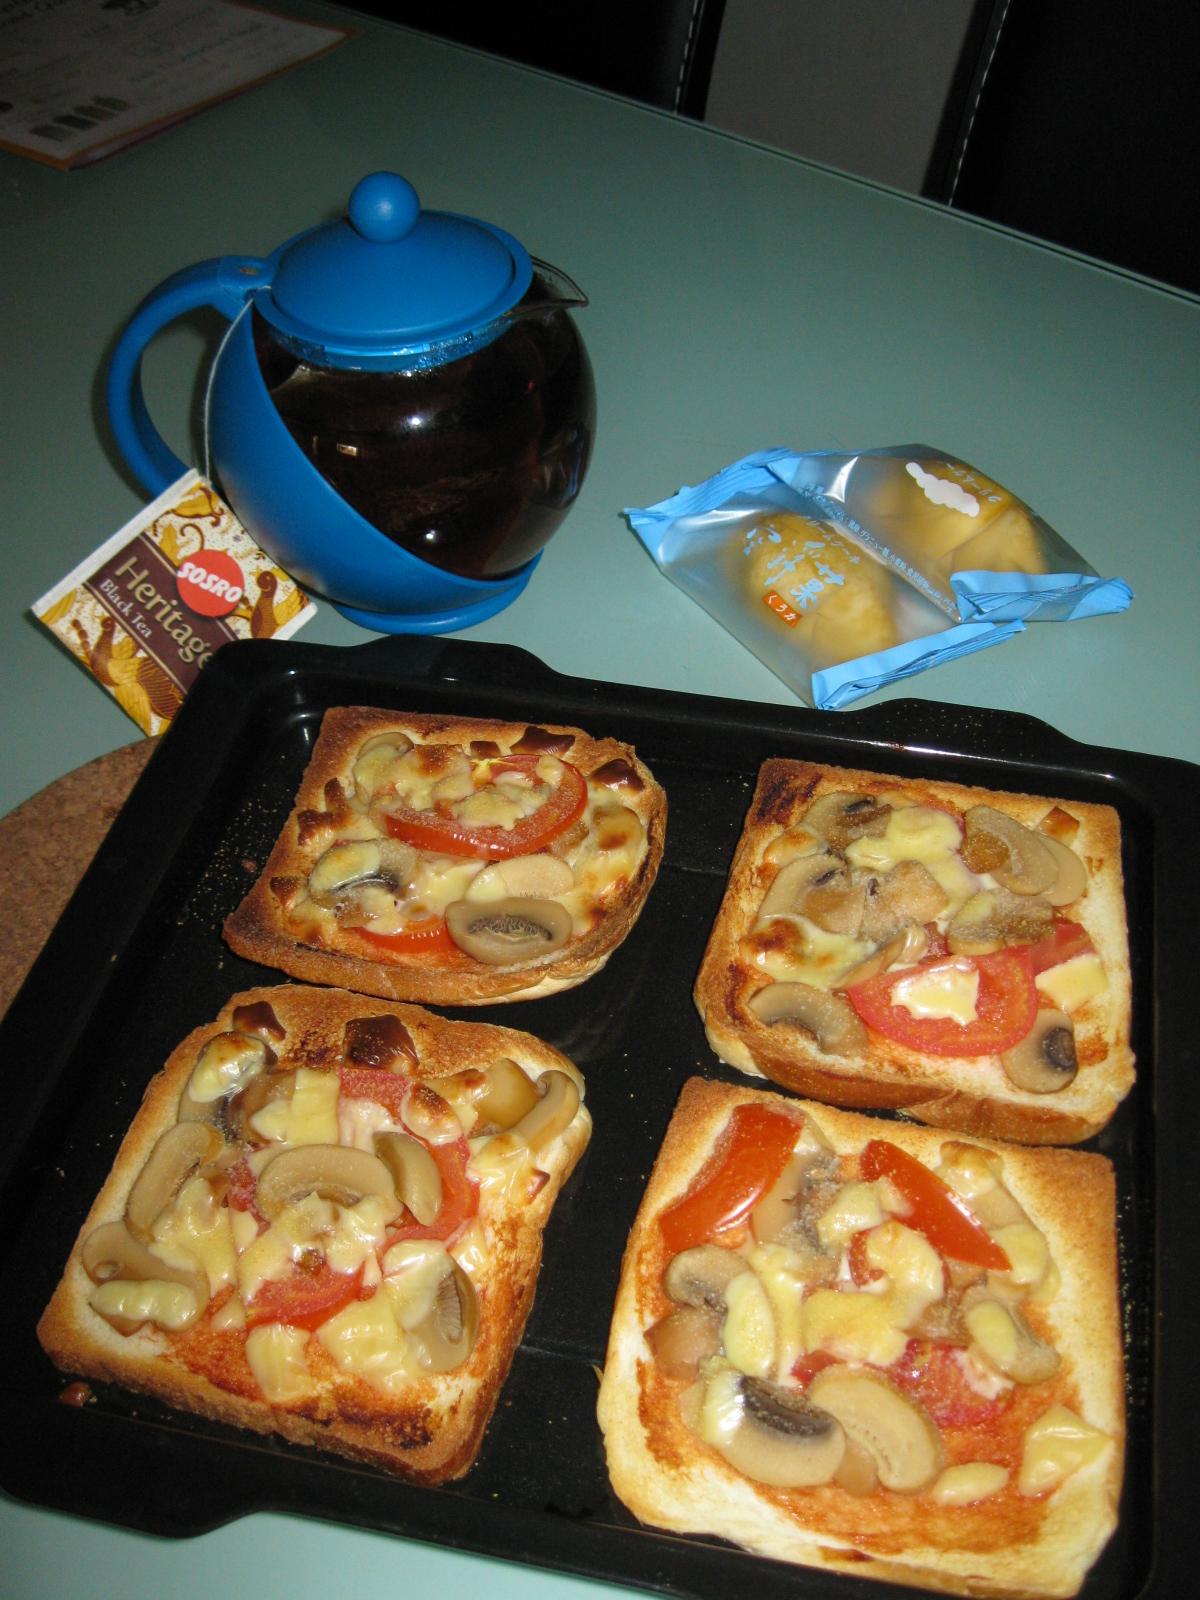 Jk kitchen creations diy pizza for Kitchen creations